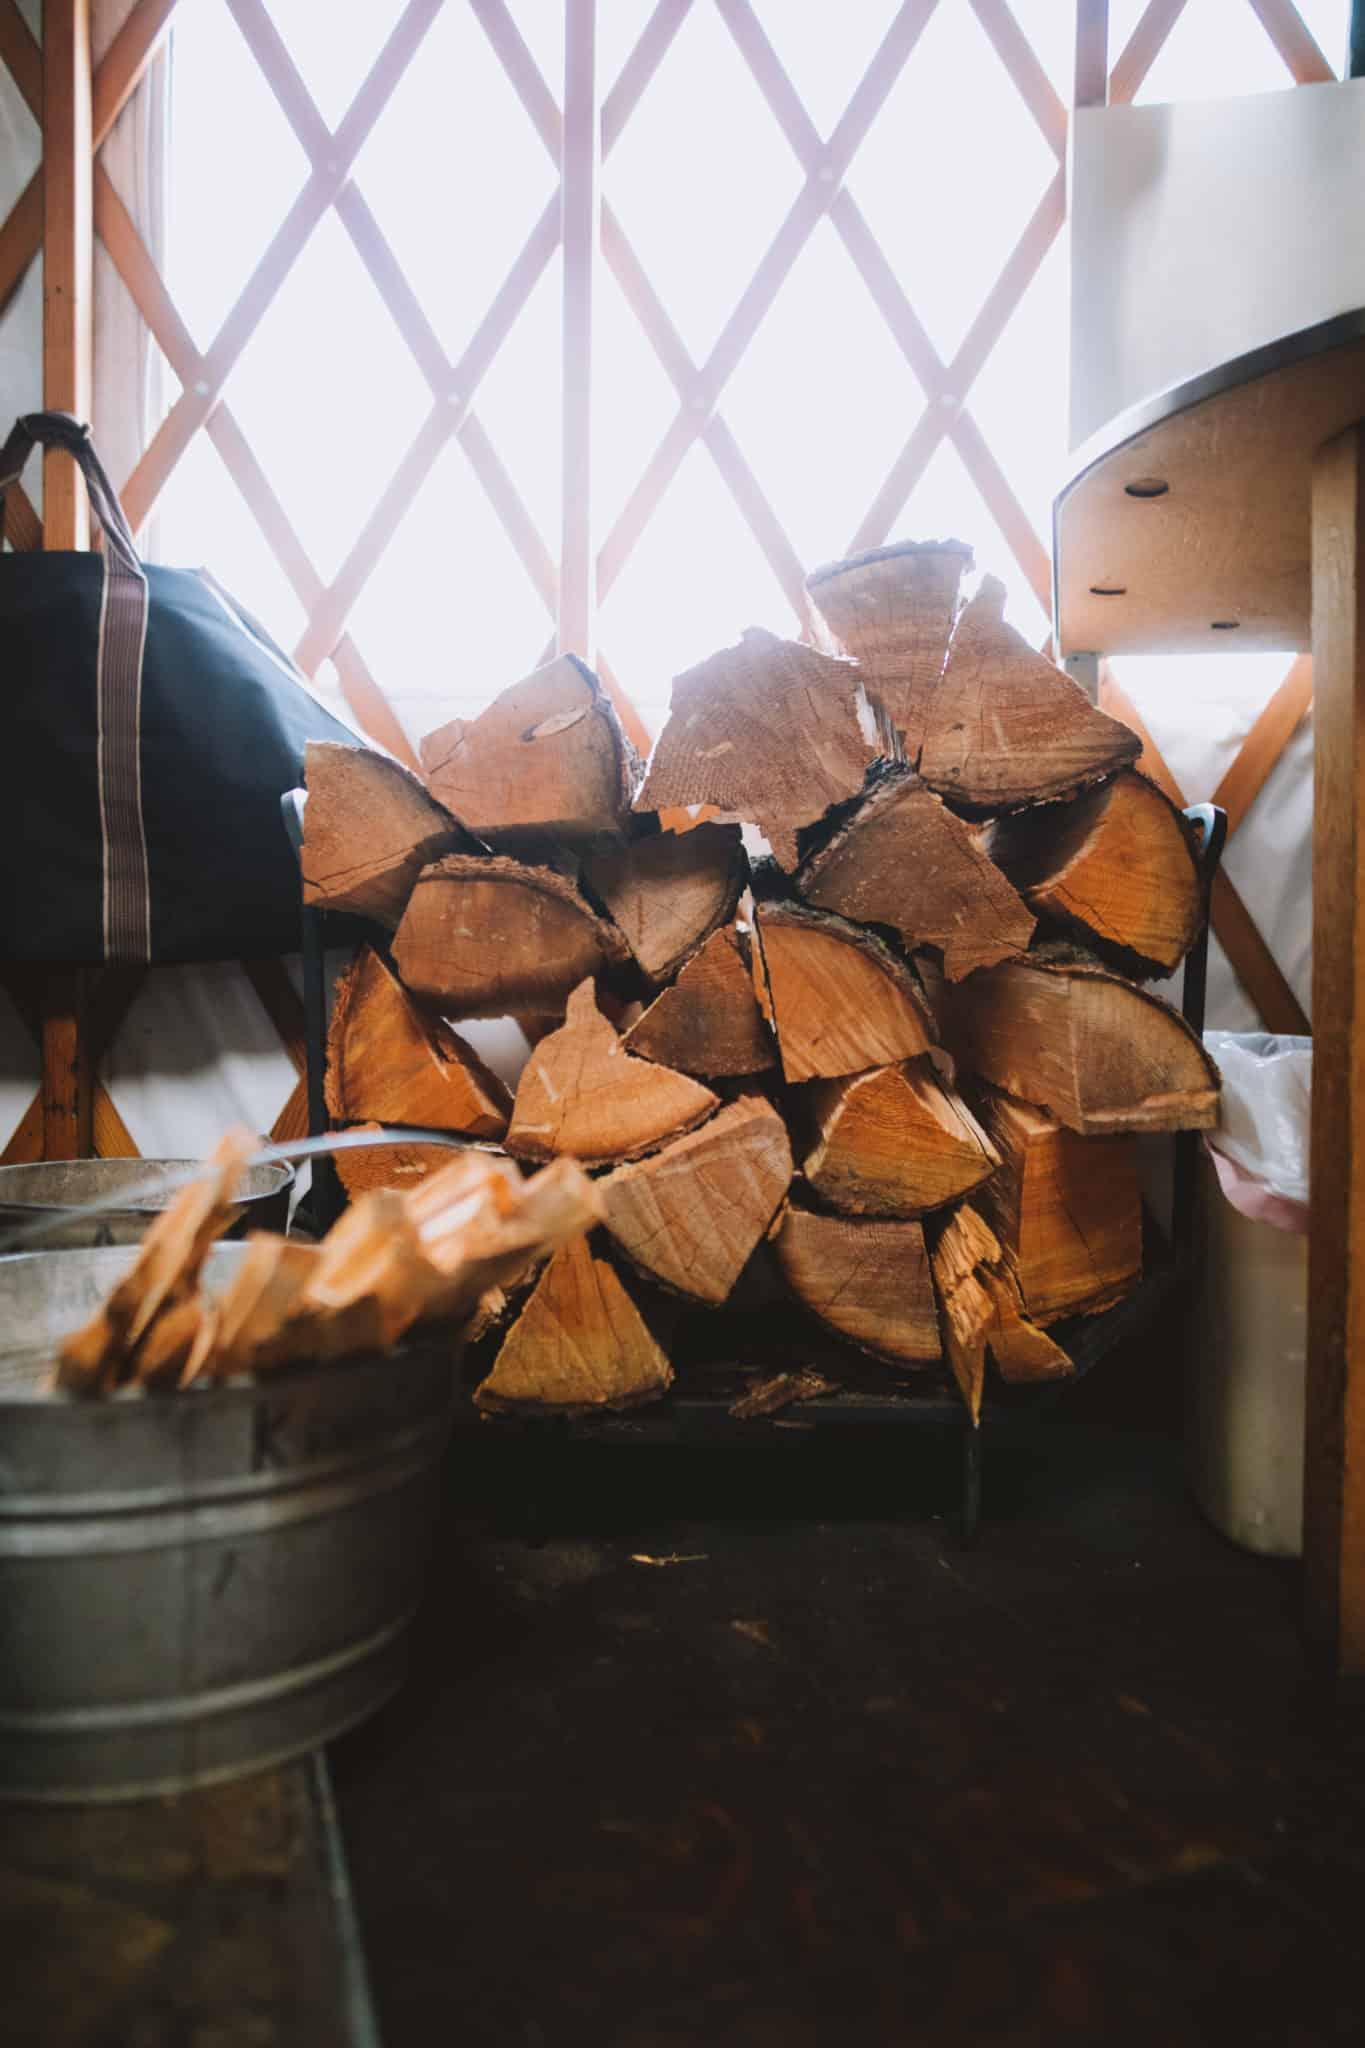 firewood pile inside the yurt